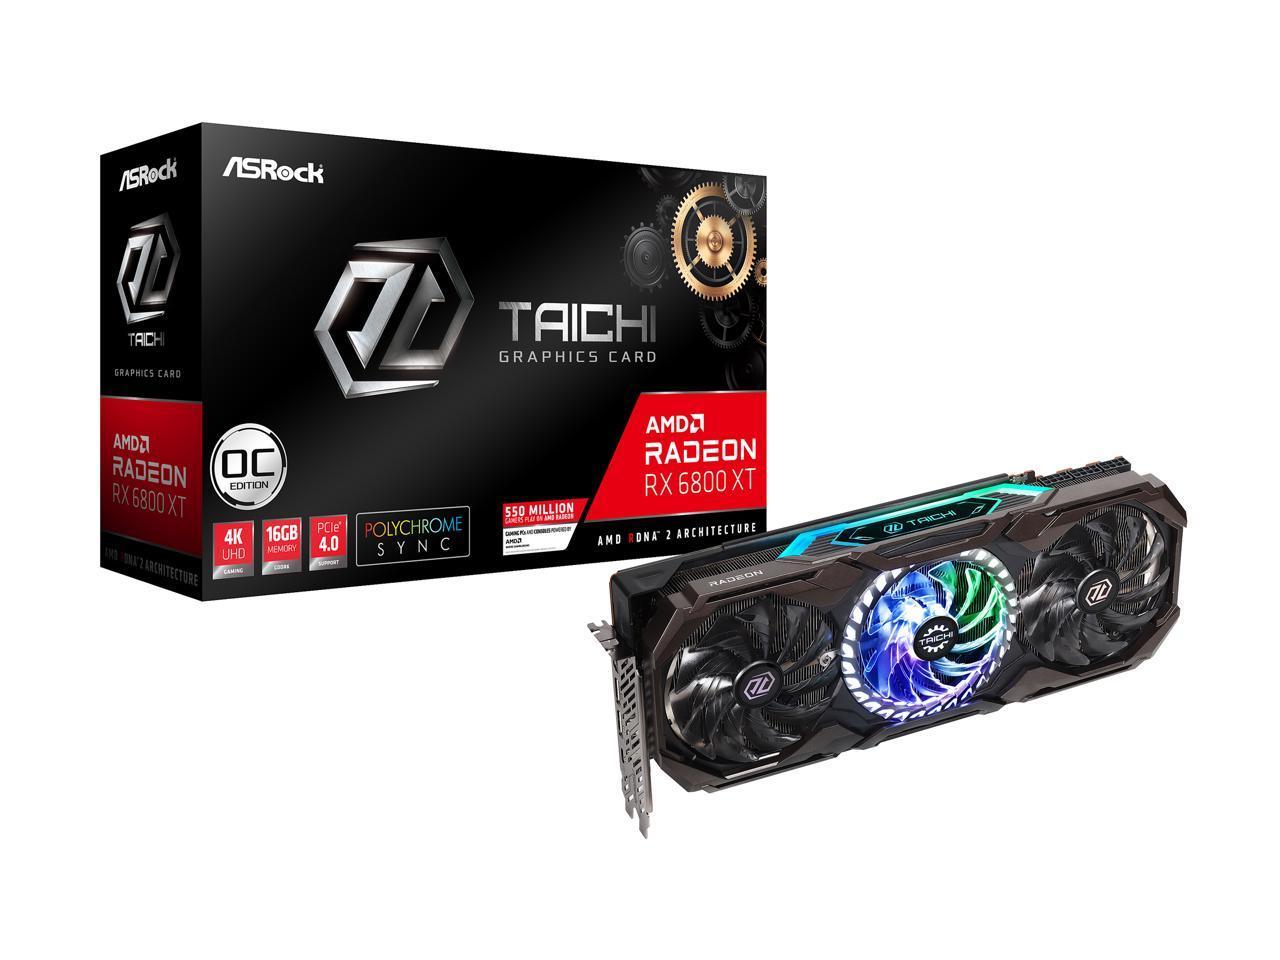 ASRock Radeon RX 6800 XT Taichi Gaming Graphics Card with 16GB GDDR6, AMD RDNA 2 (RX6800XT TCX 16GO)